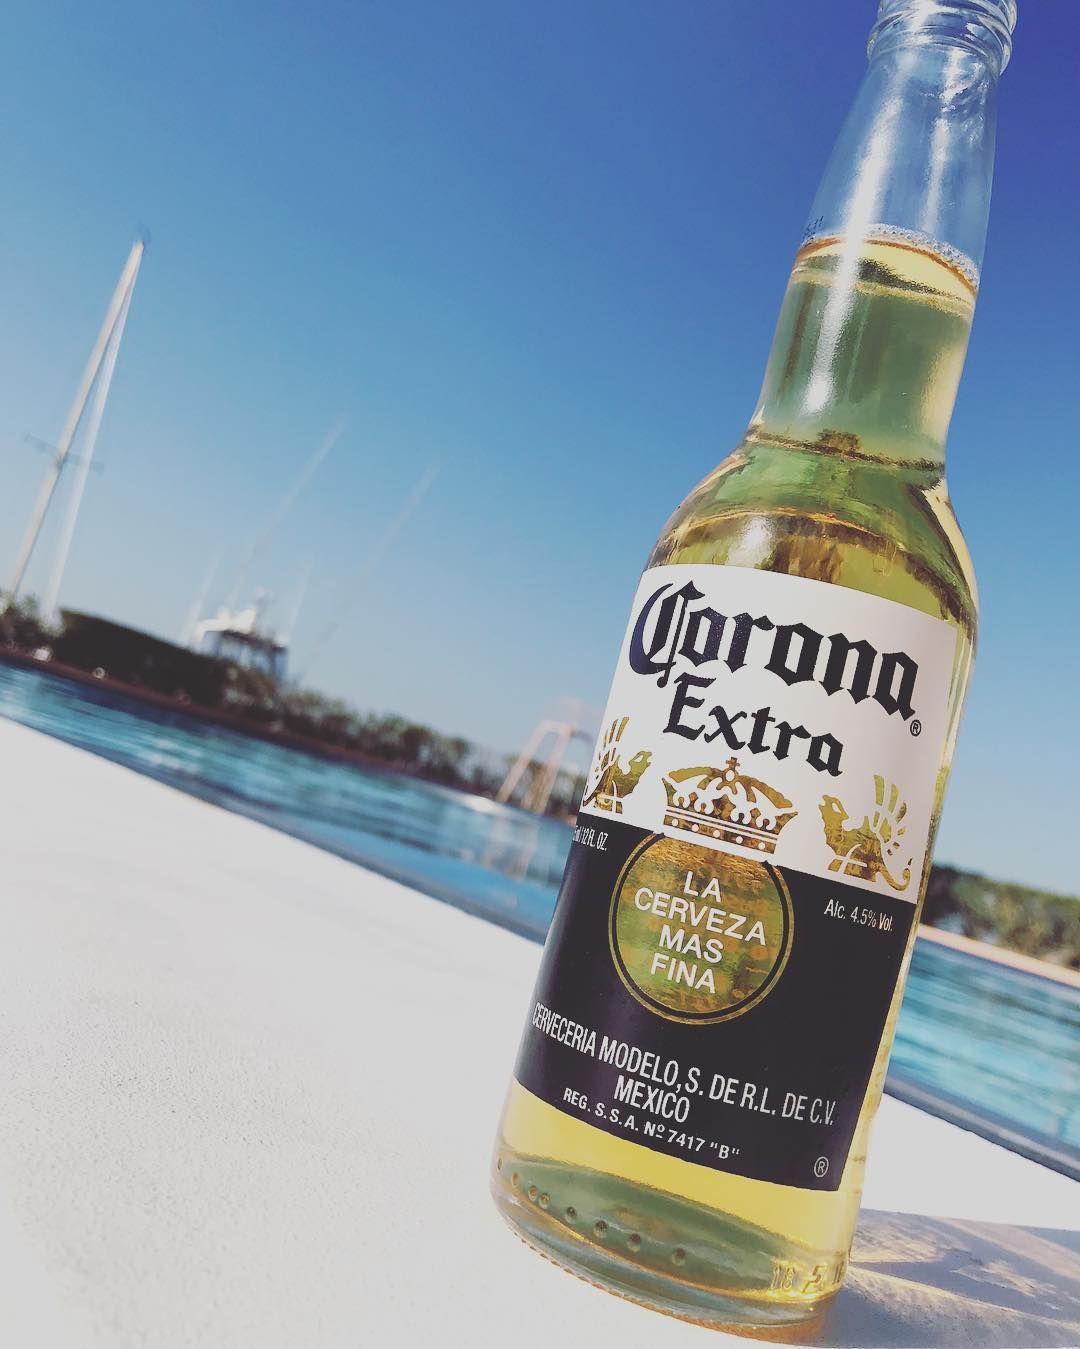 Mexico Corona Extra Lime Beer Cerveza Beach Vinyl Wall Decal Decor Sticker Quote